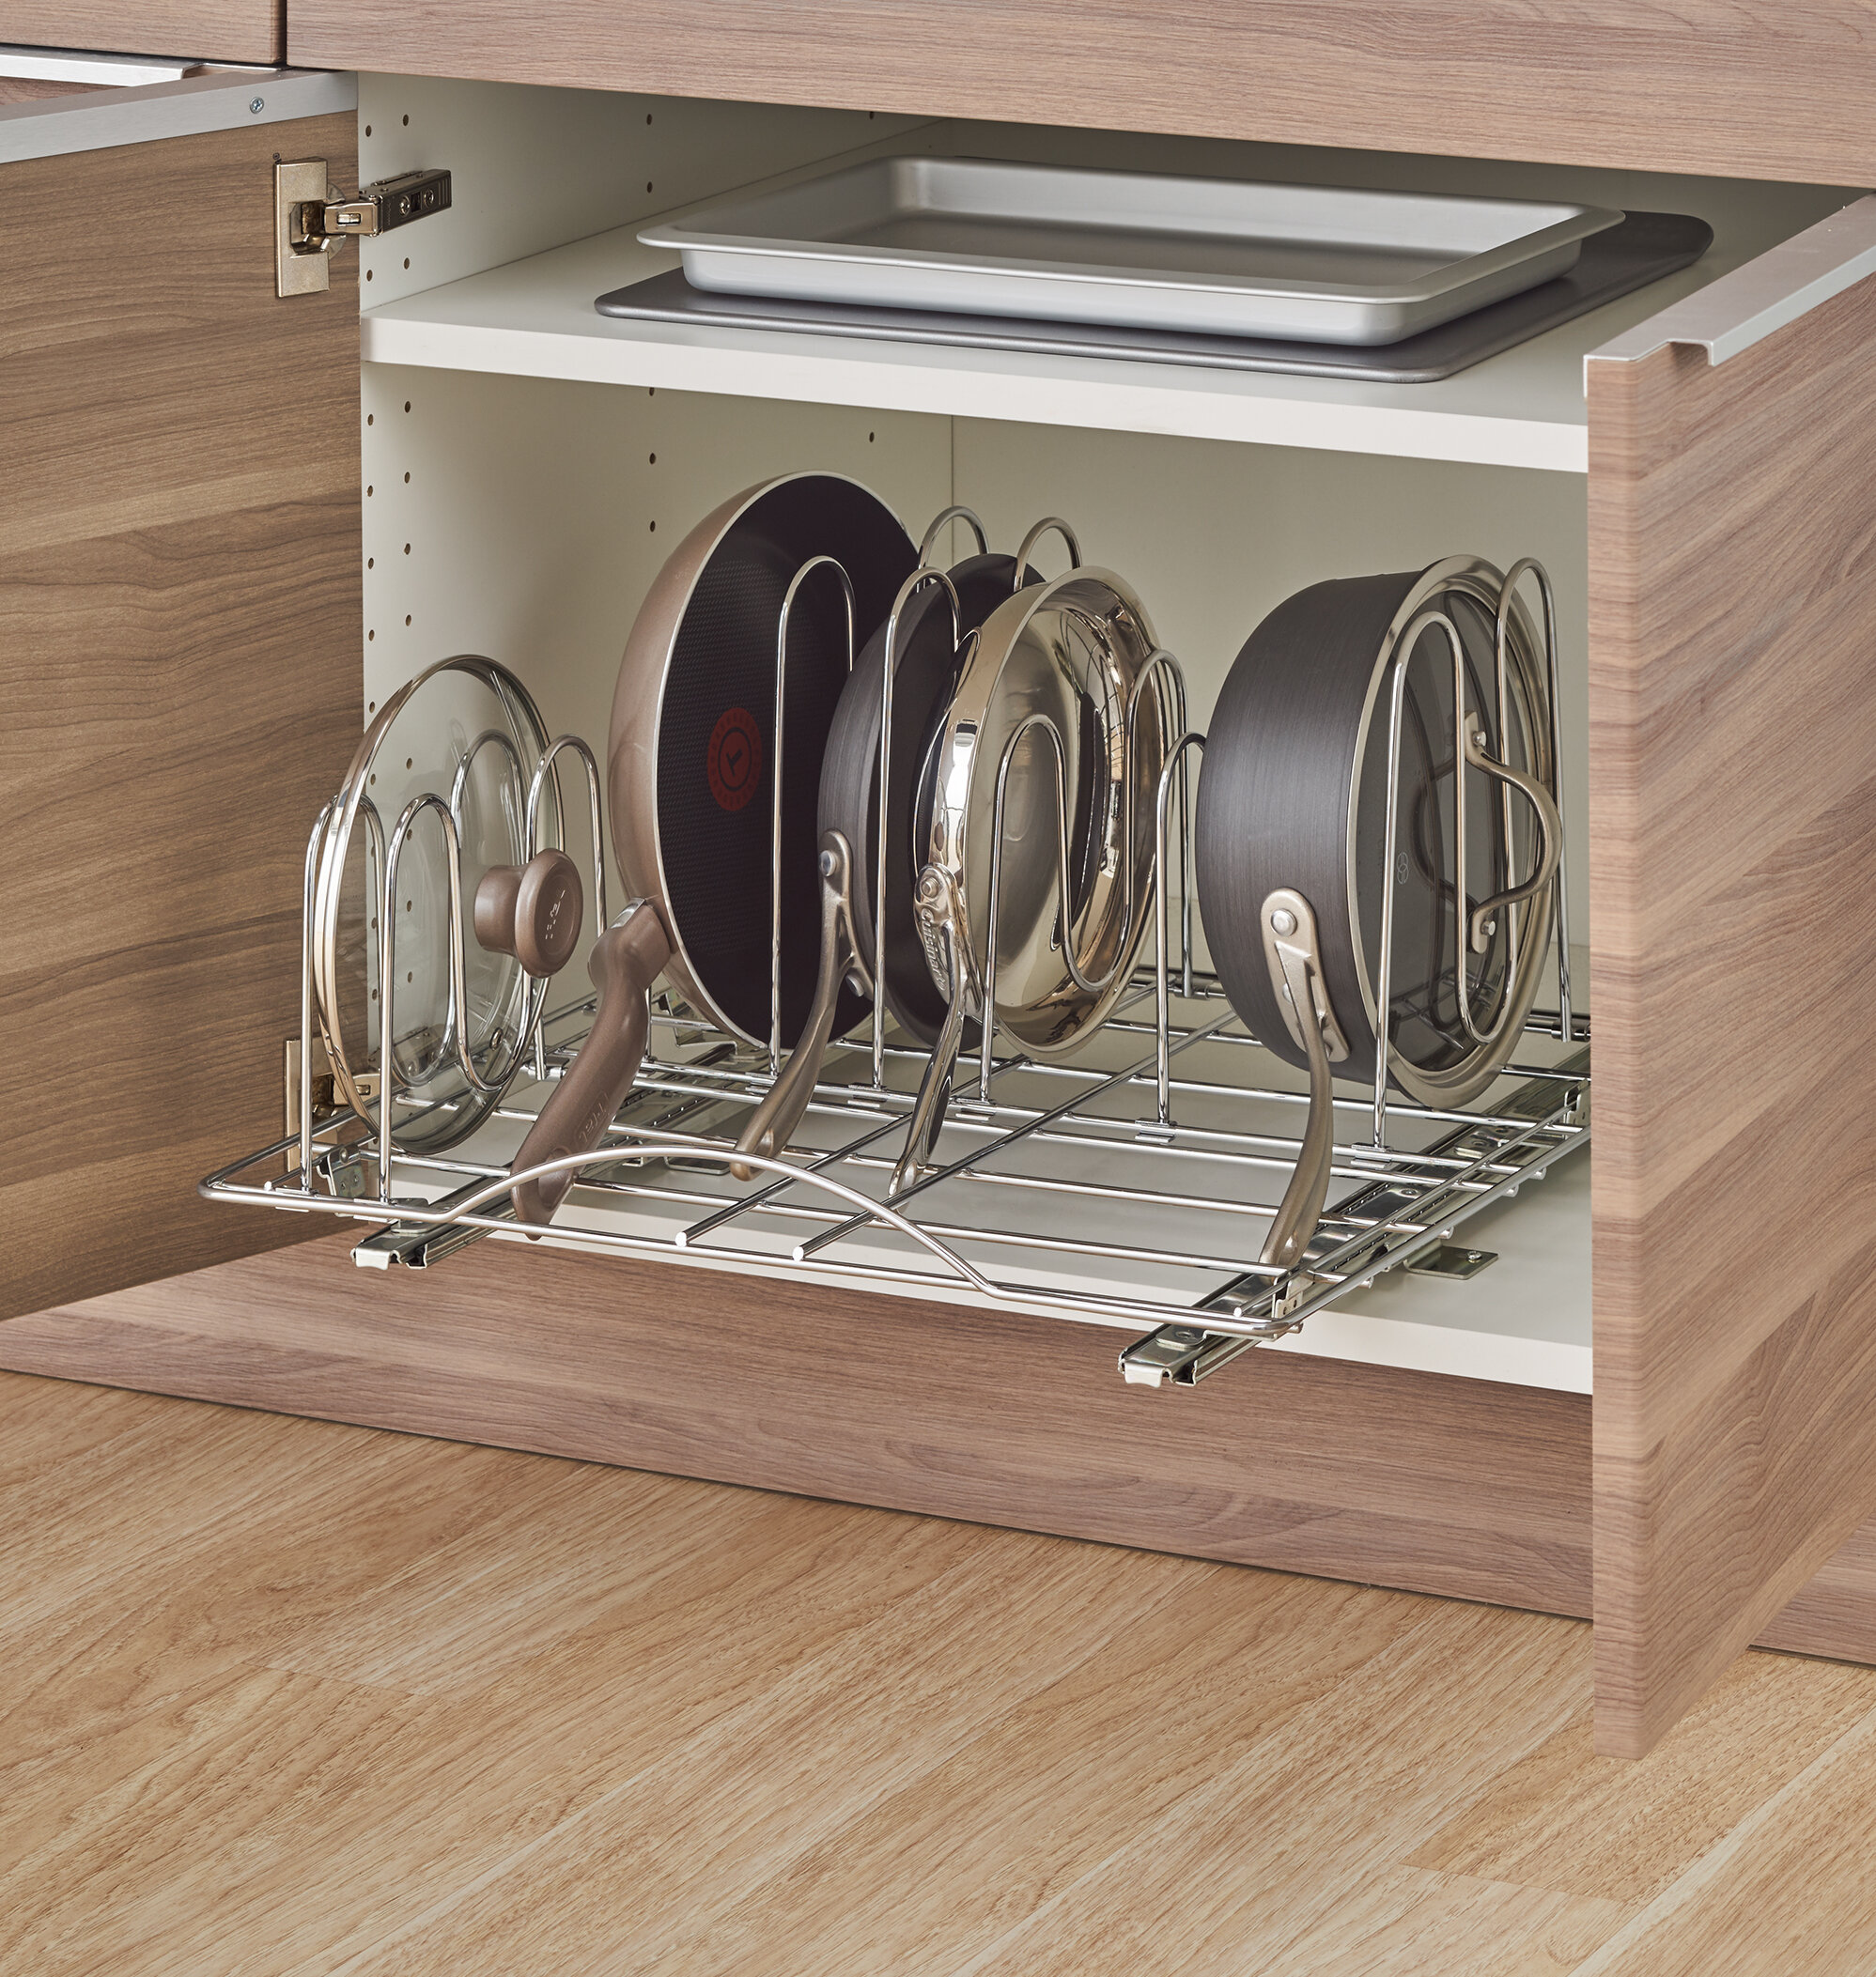 Trinity Sliding Pot Organizer Pull Out Kitchenware Divider U0026 Reviews |  Wayfair